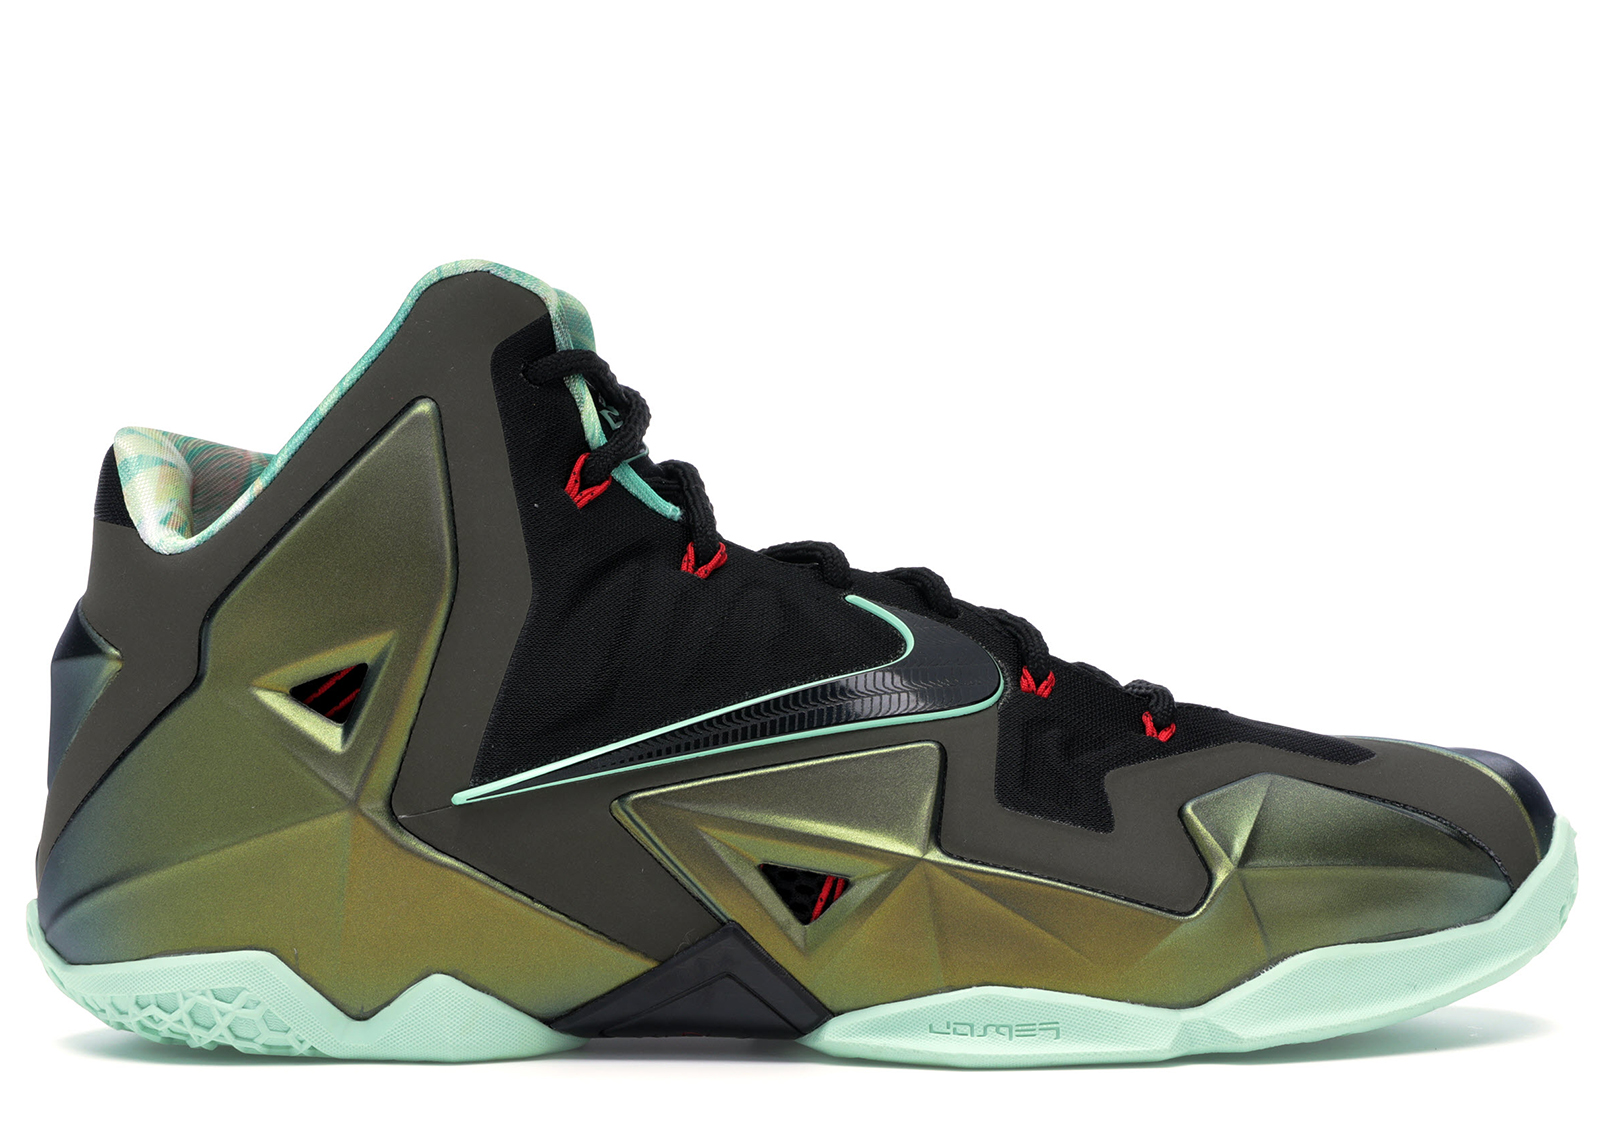 Nike LeBron 11 King's Pride - 616175-700